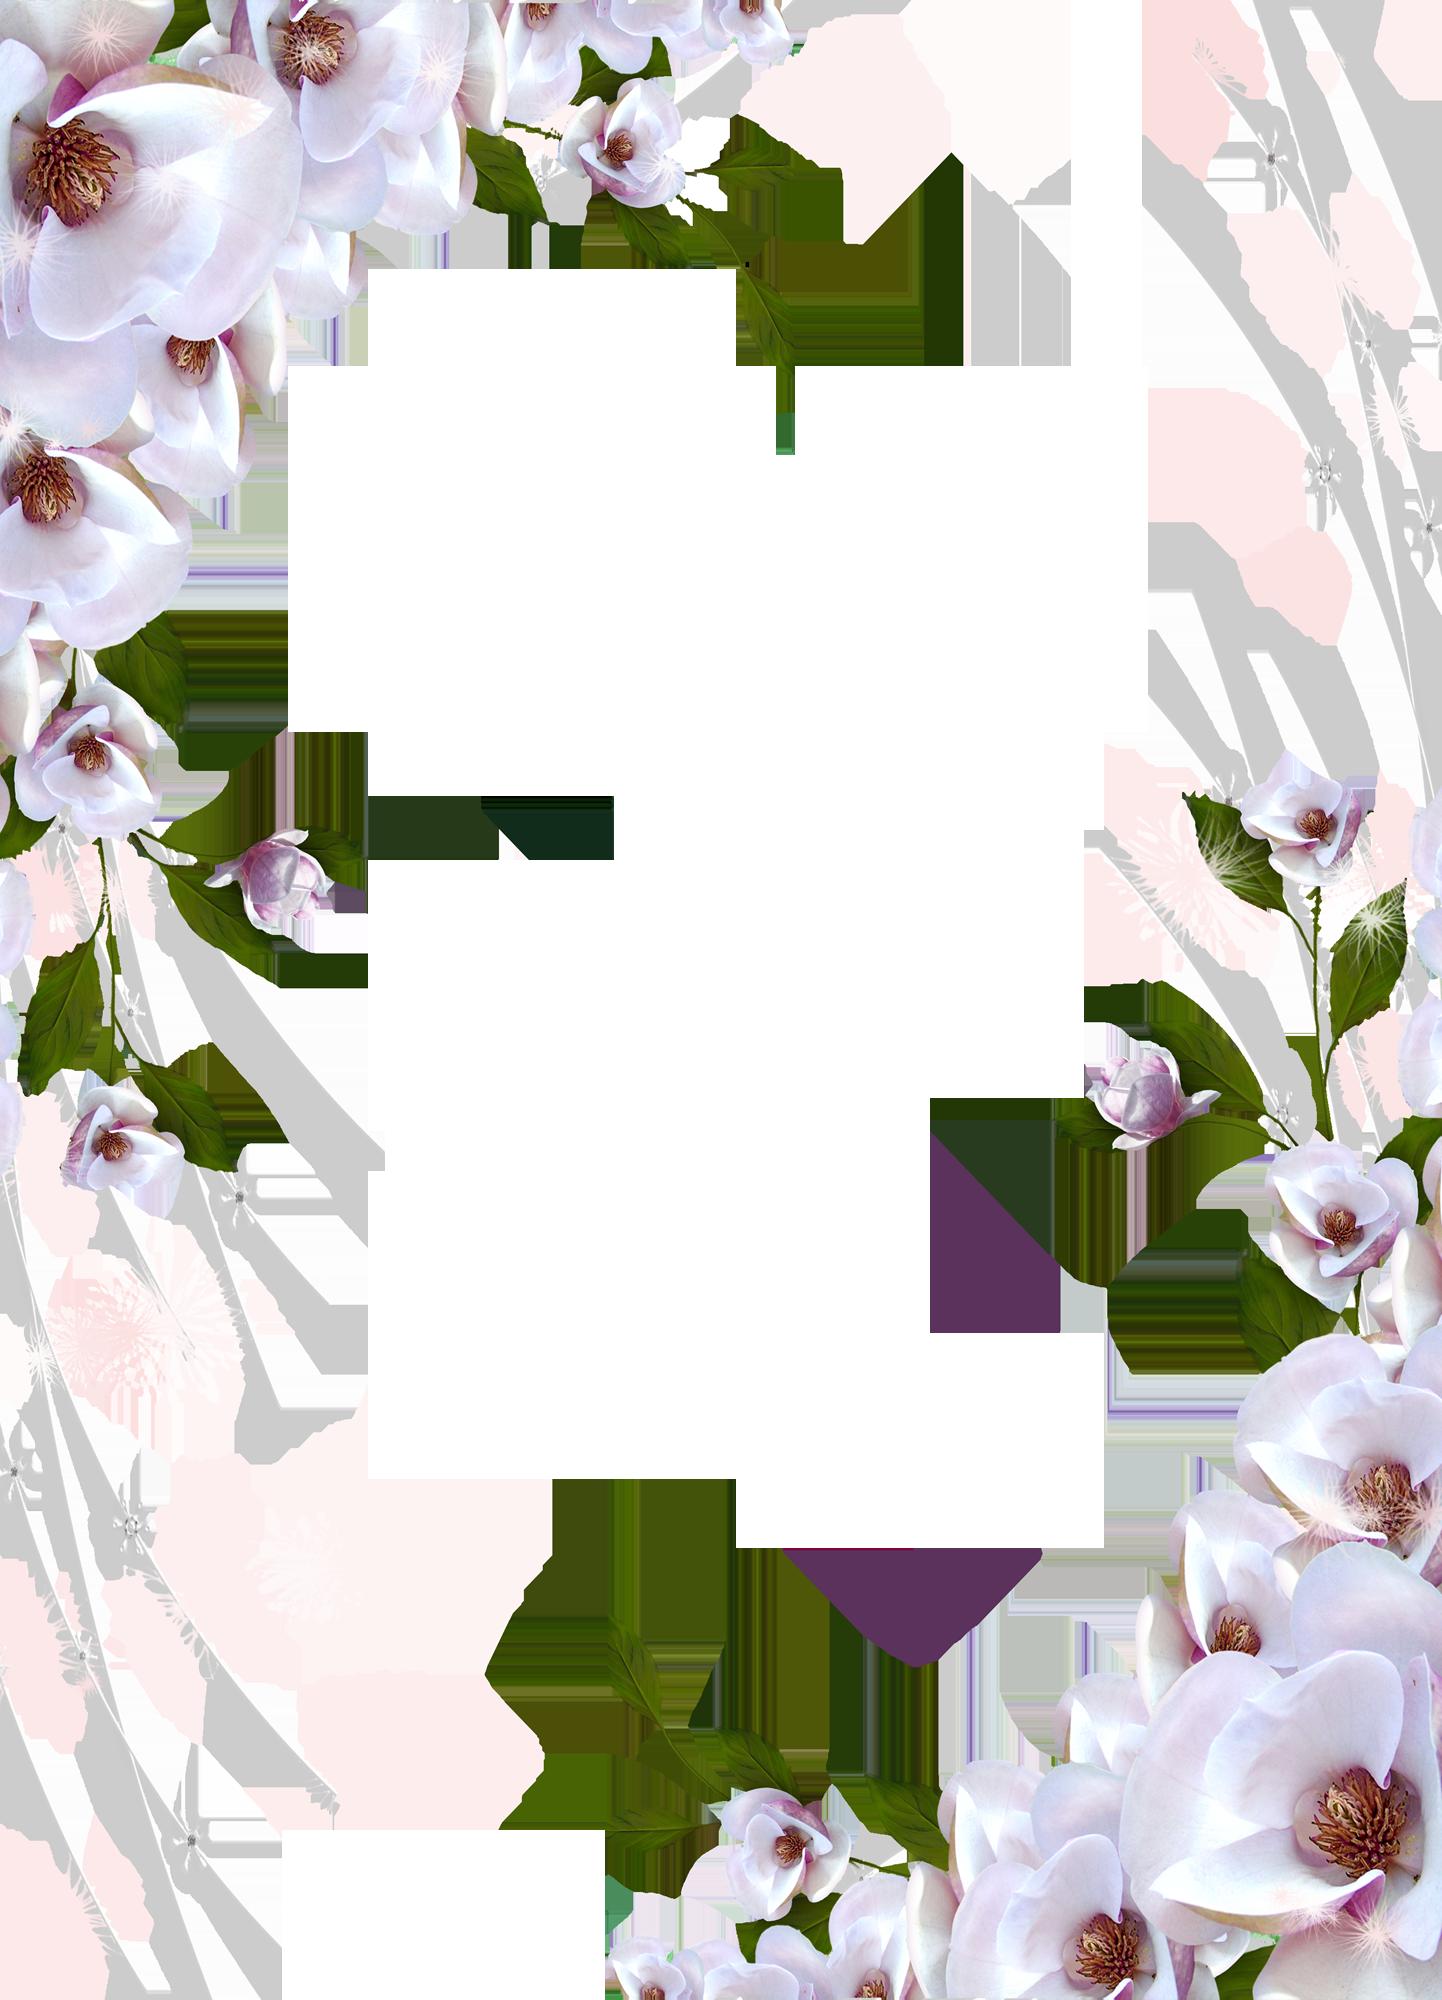 Transparent photo frame beautiful flowers frames and borders transparent photo frame beautiful flowers izmirmasajfo